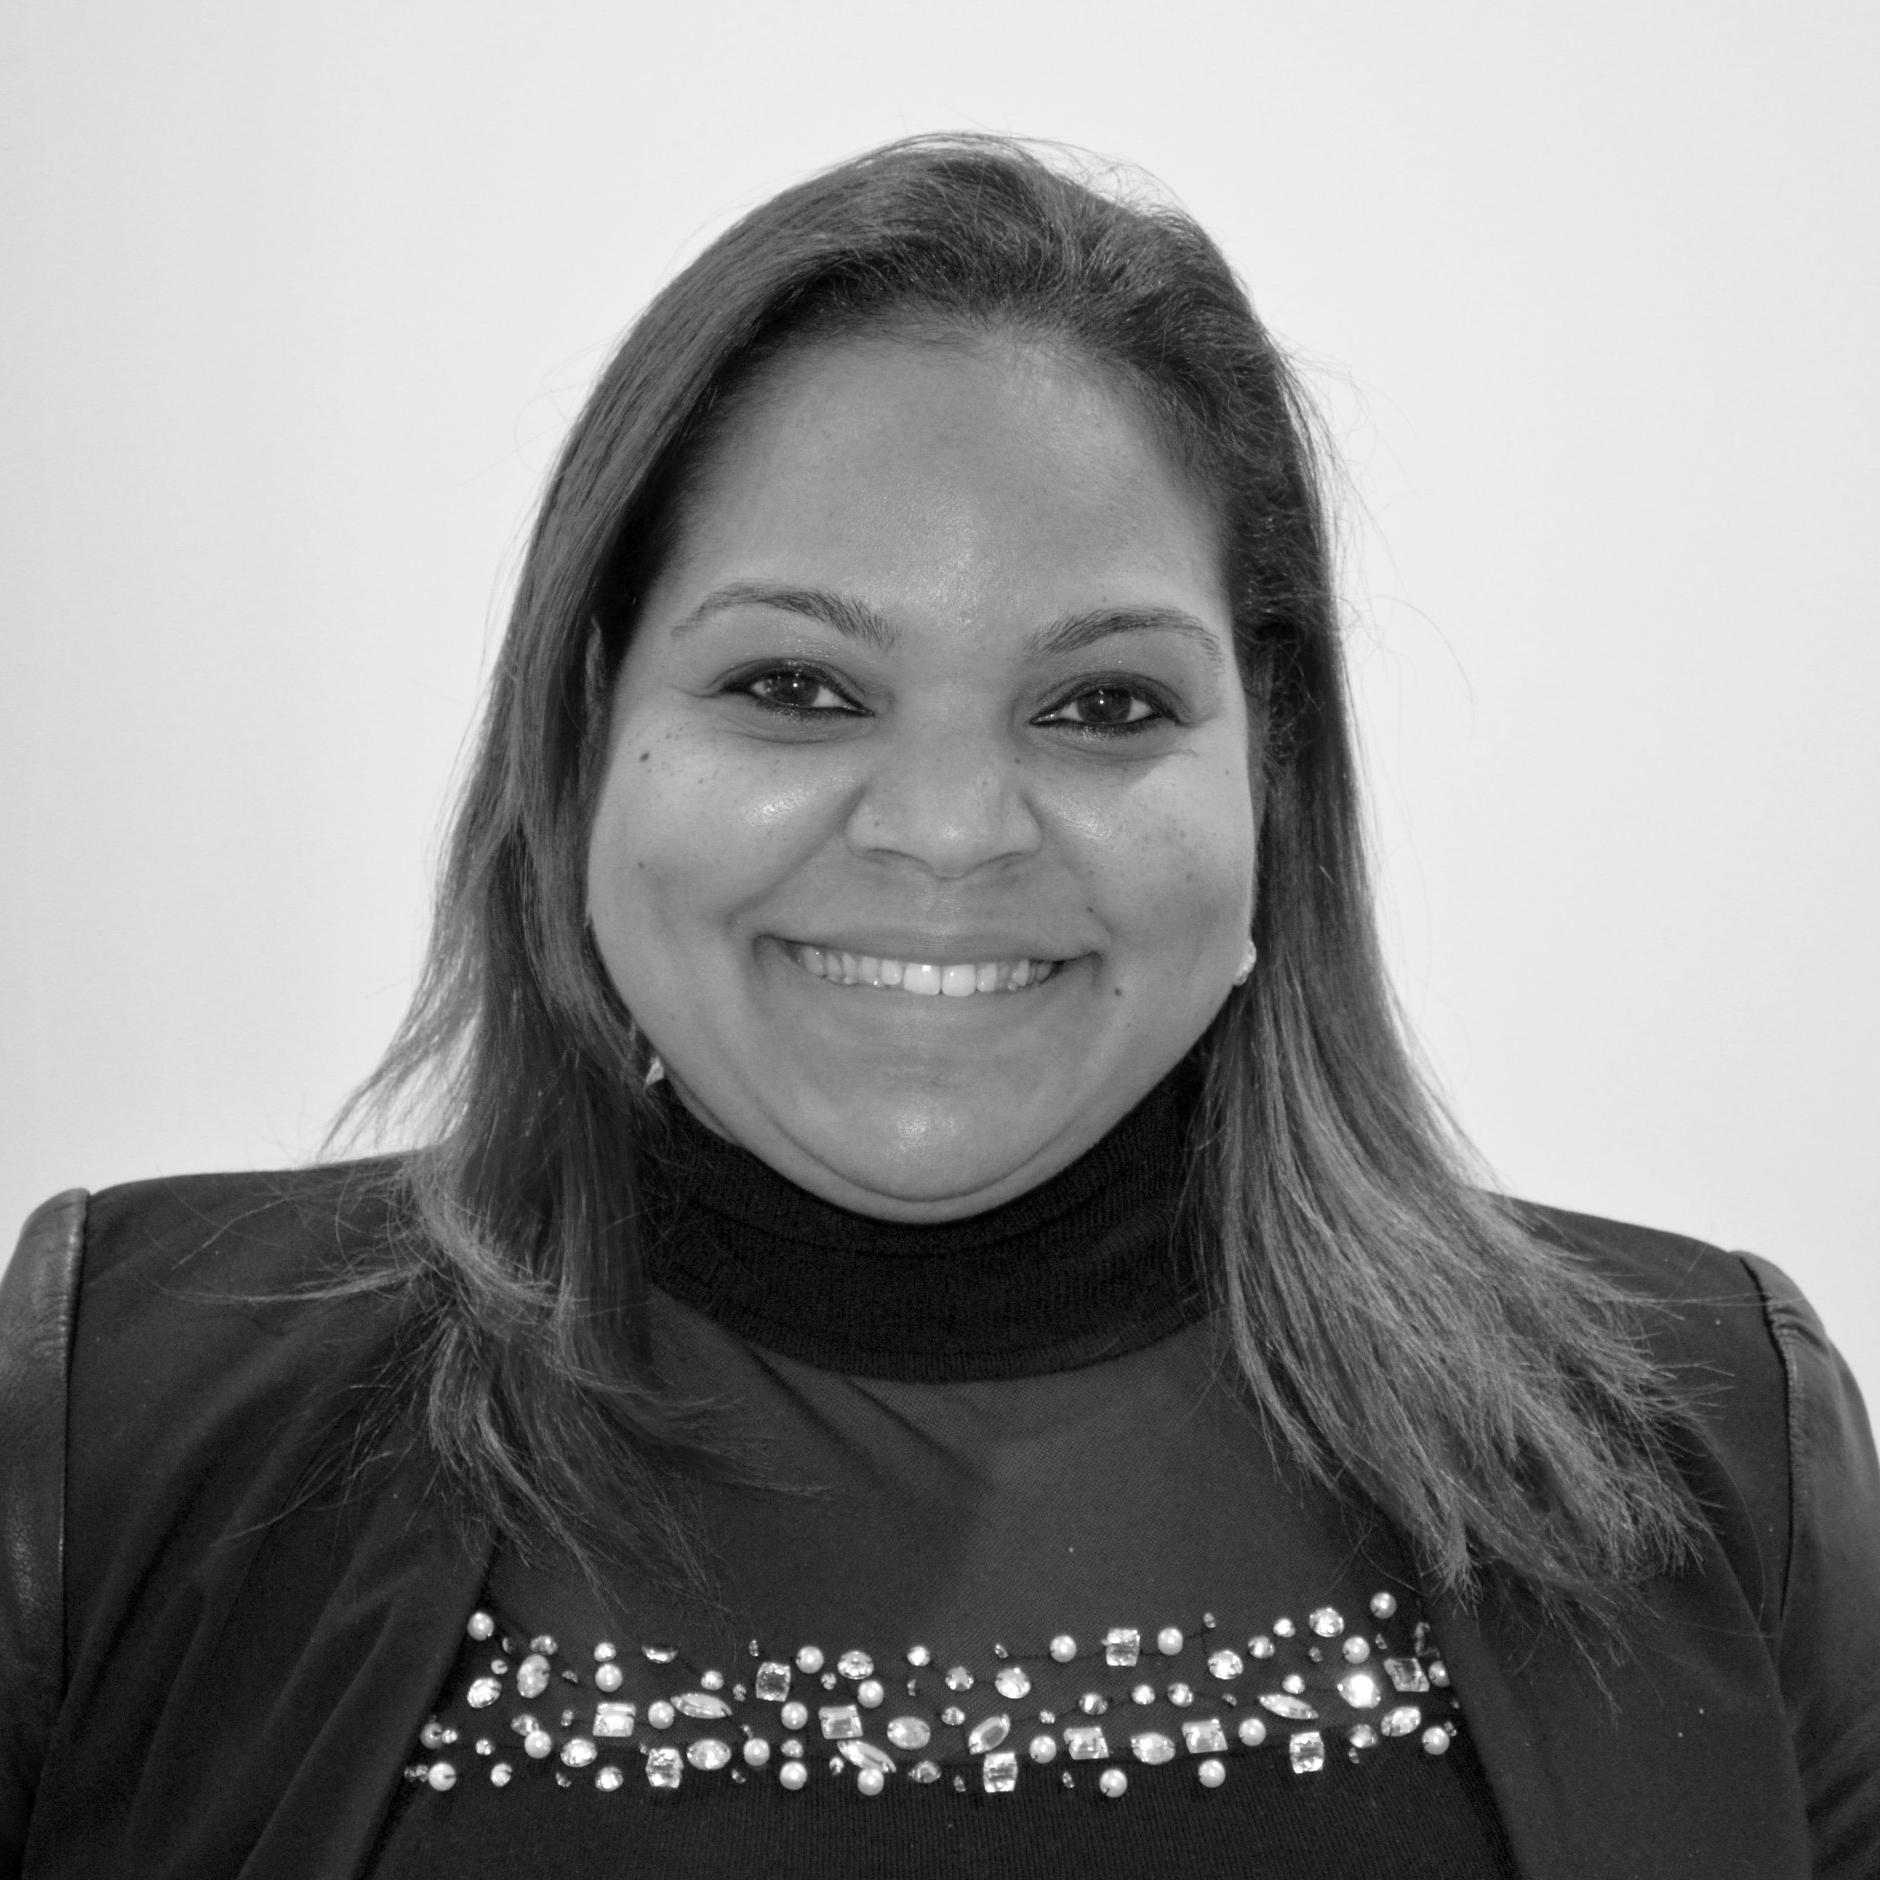 Cathy Sandoval